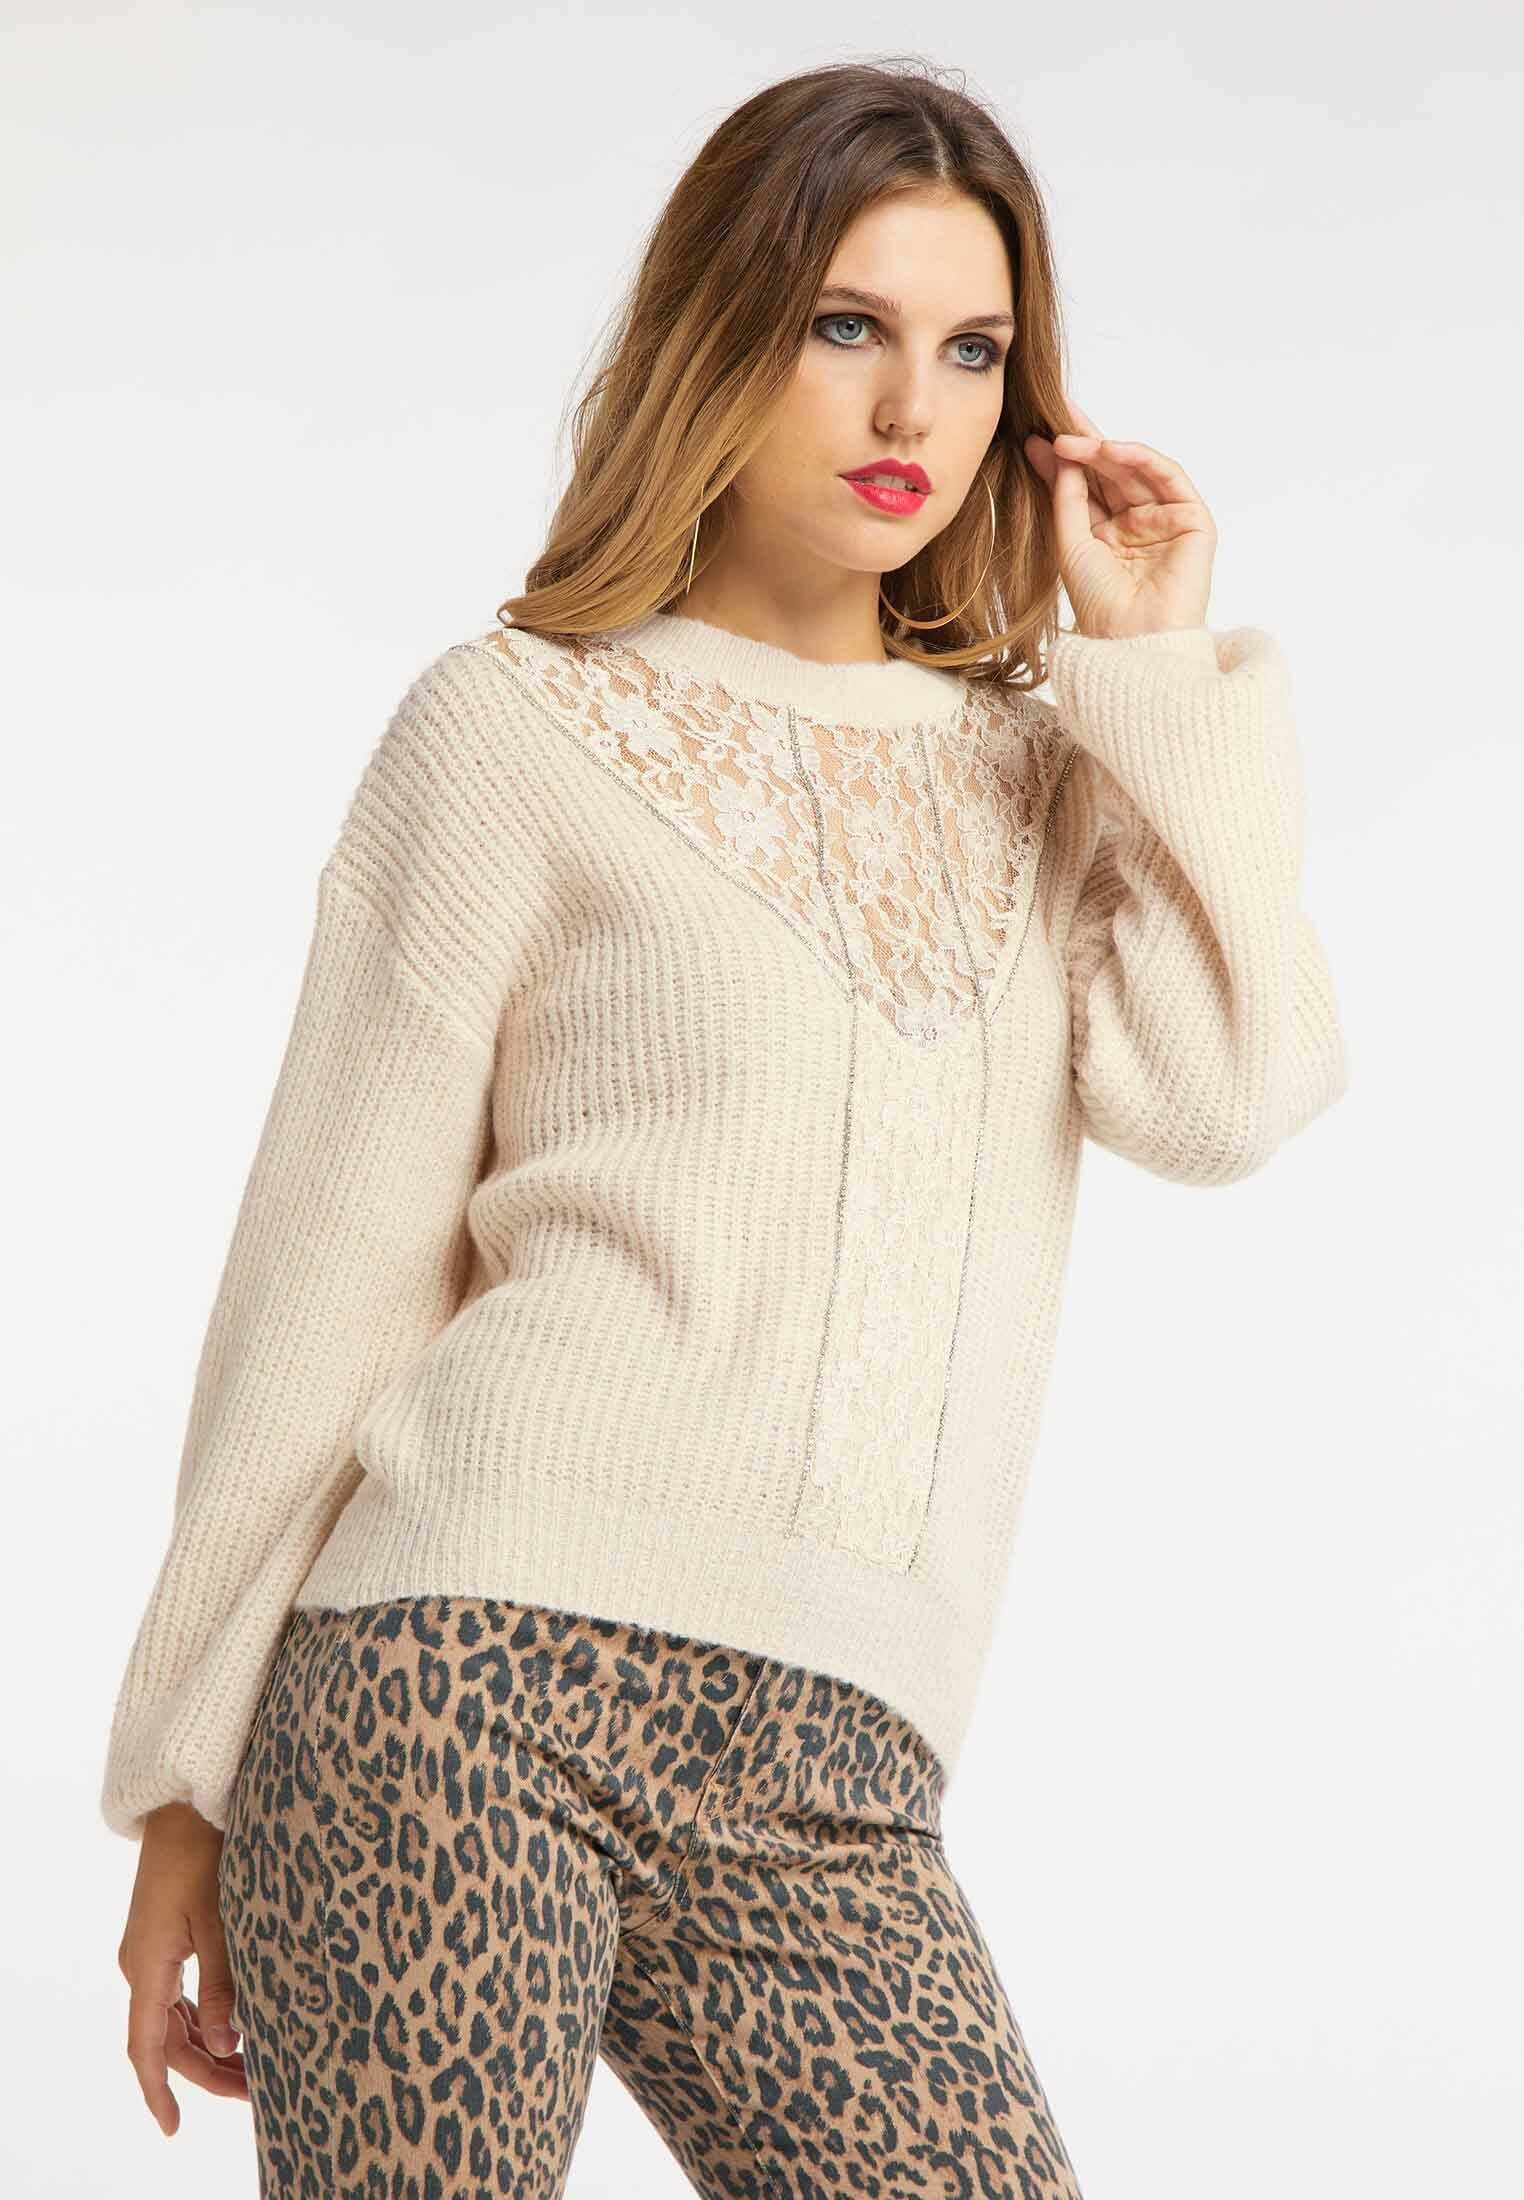 Low Cost Women's Clothing faina Jumper beige ztC5Rymmf